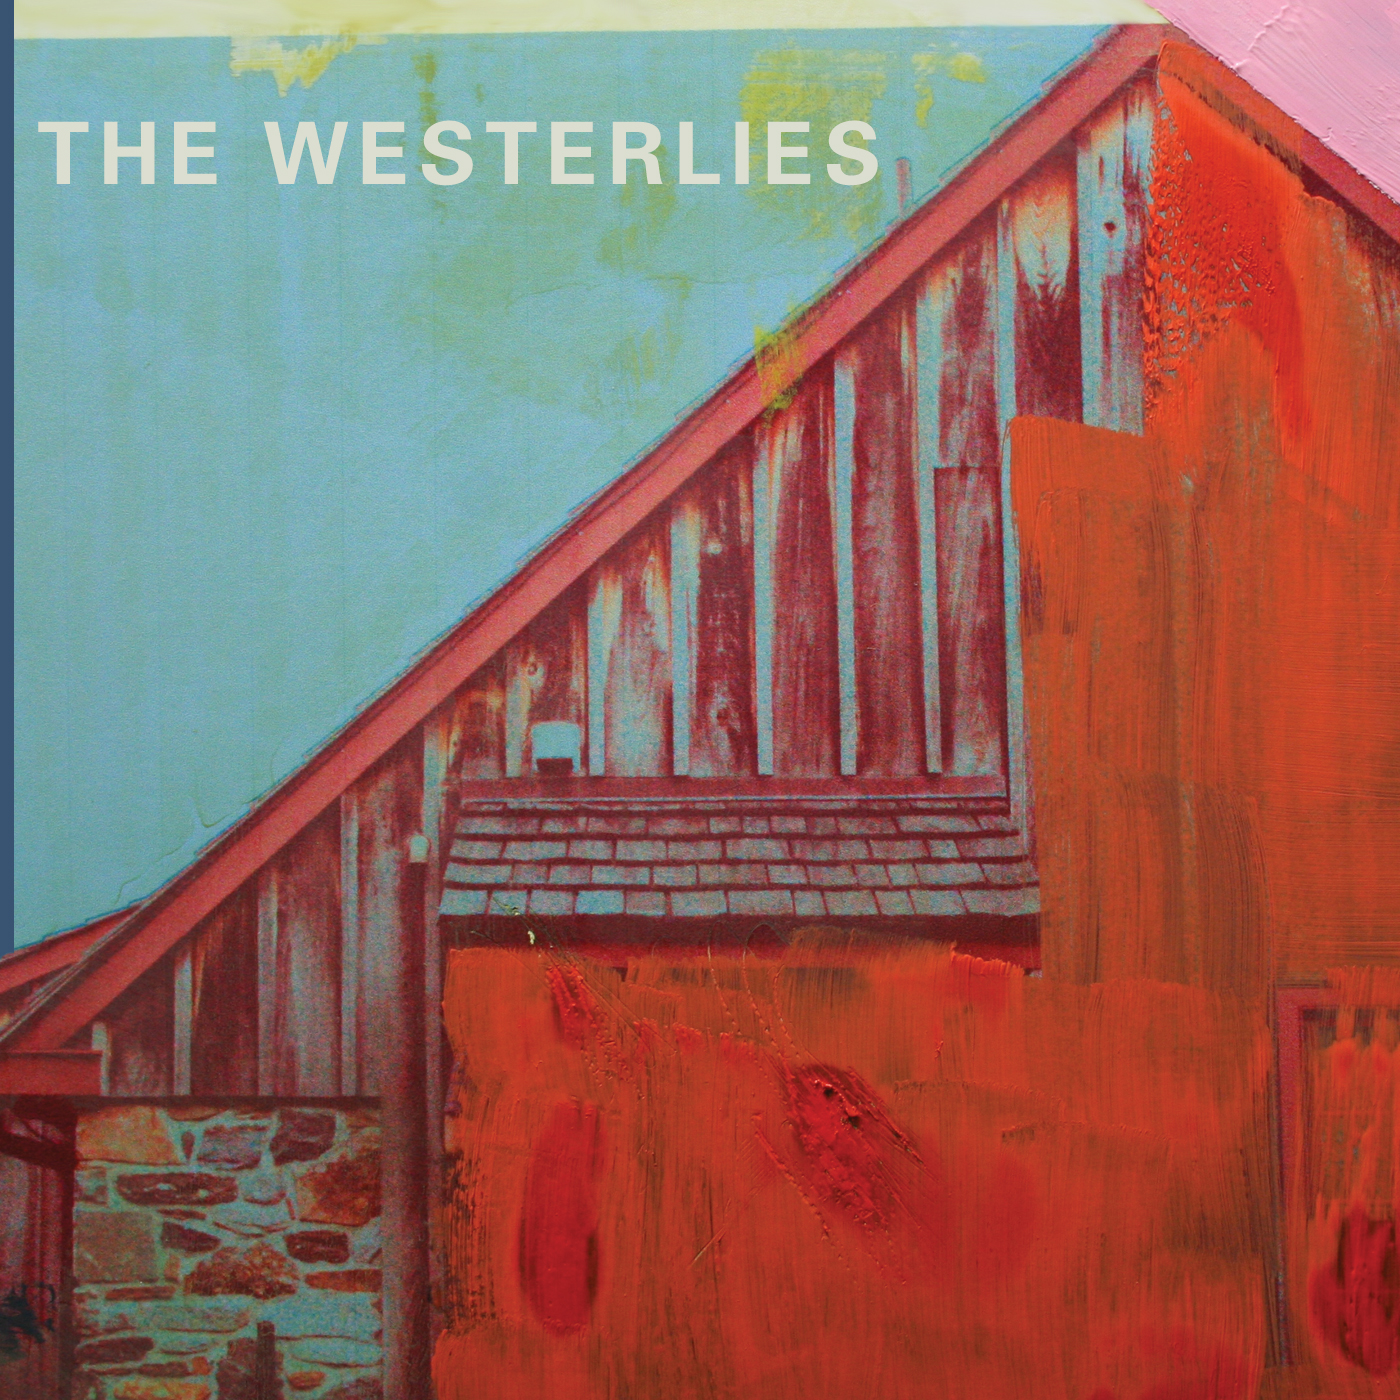 The Westerlies Album Cover SQUARE.jpg